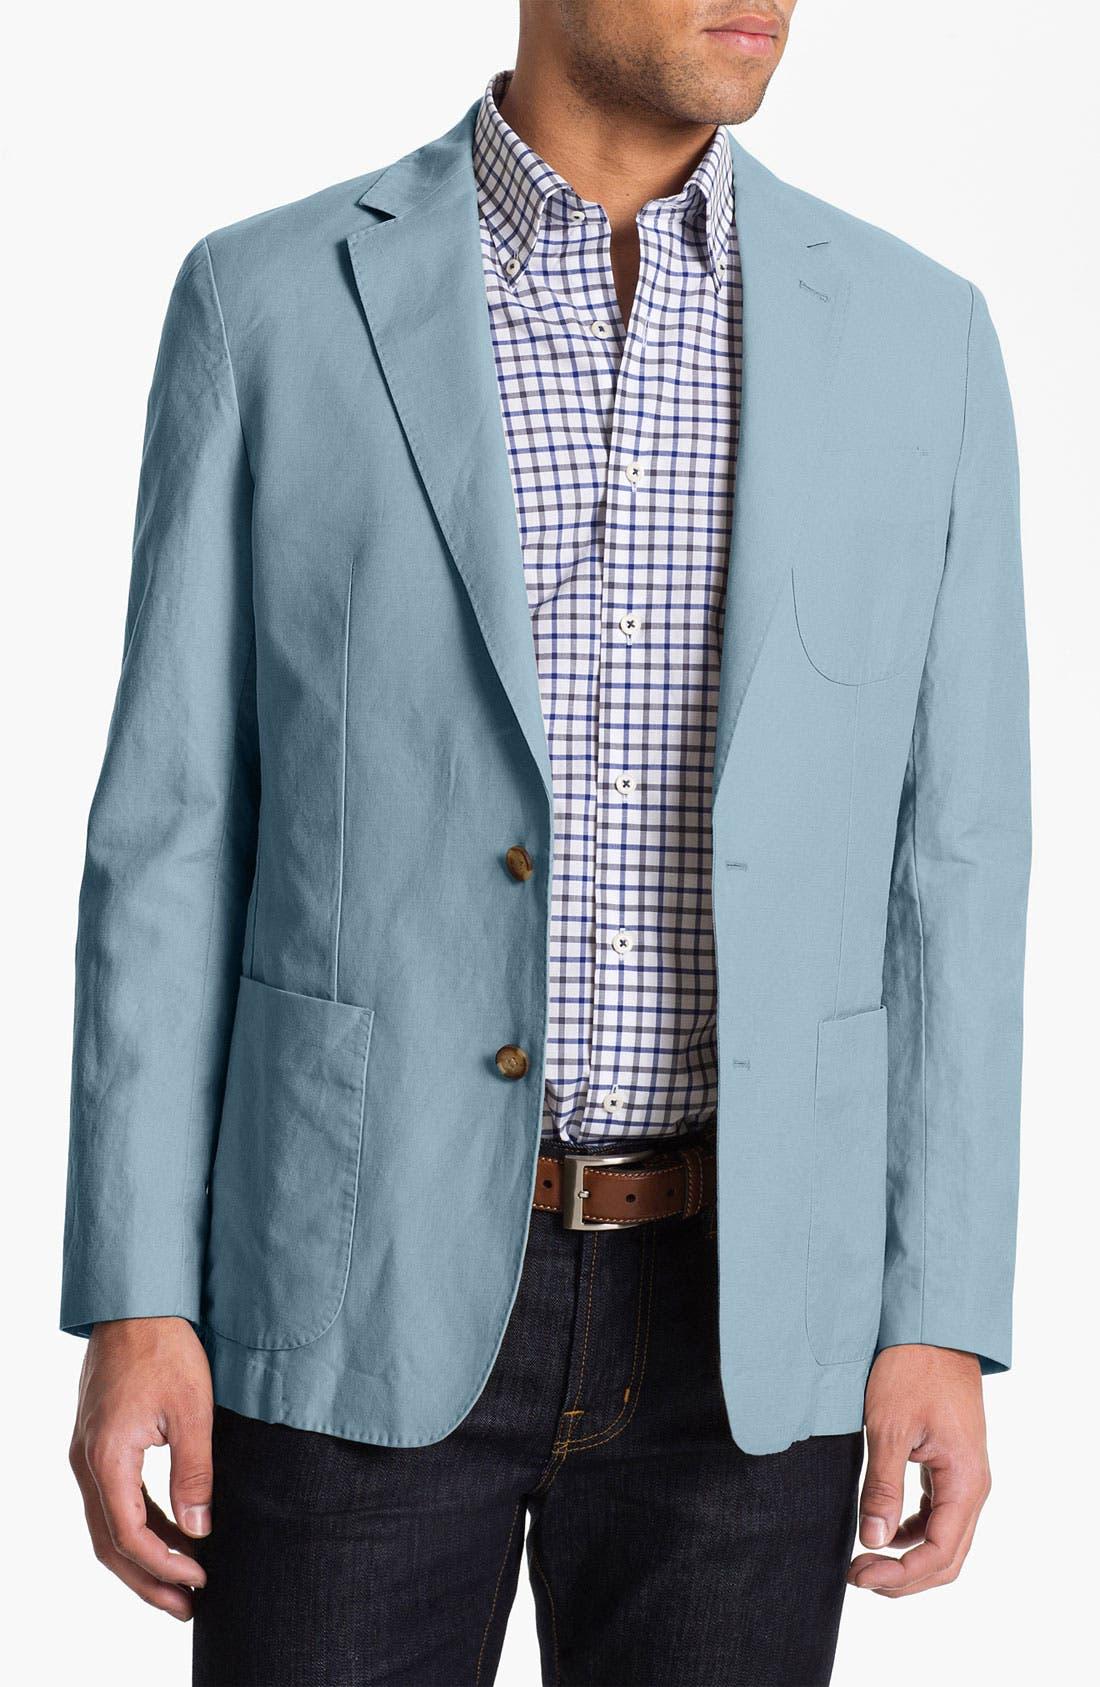 Main Image - Peter Millar Linen Blend Sportcoat